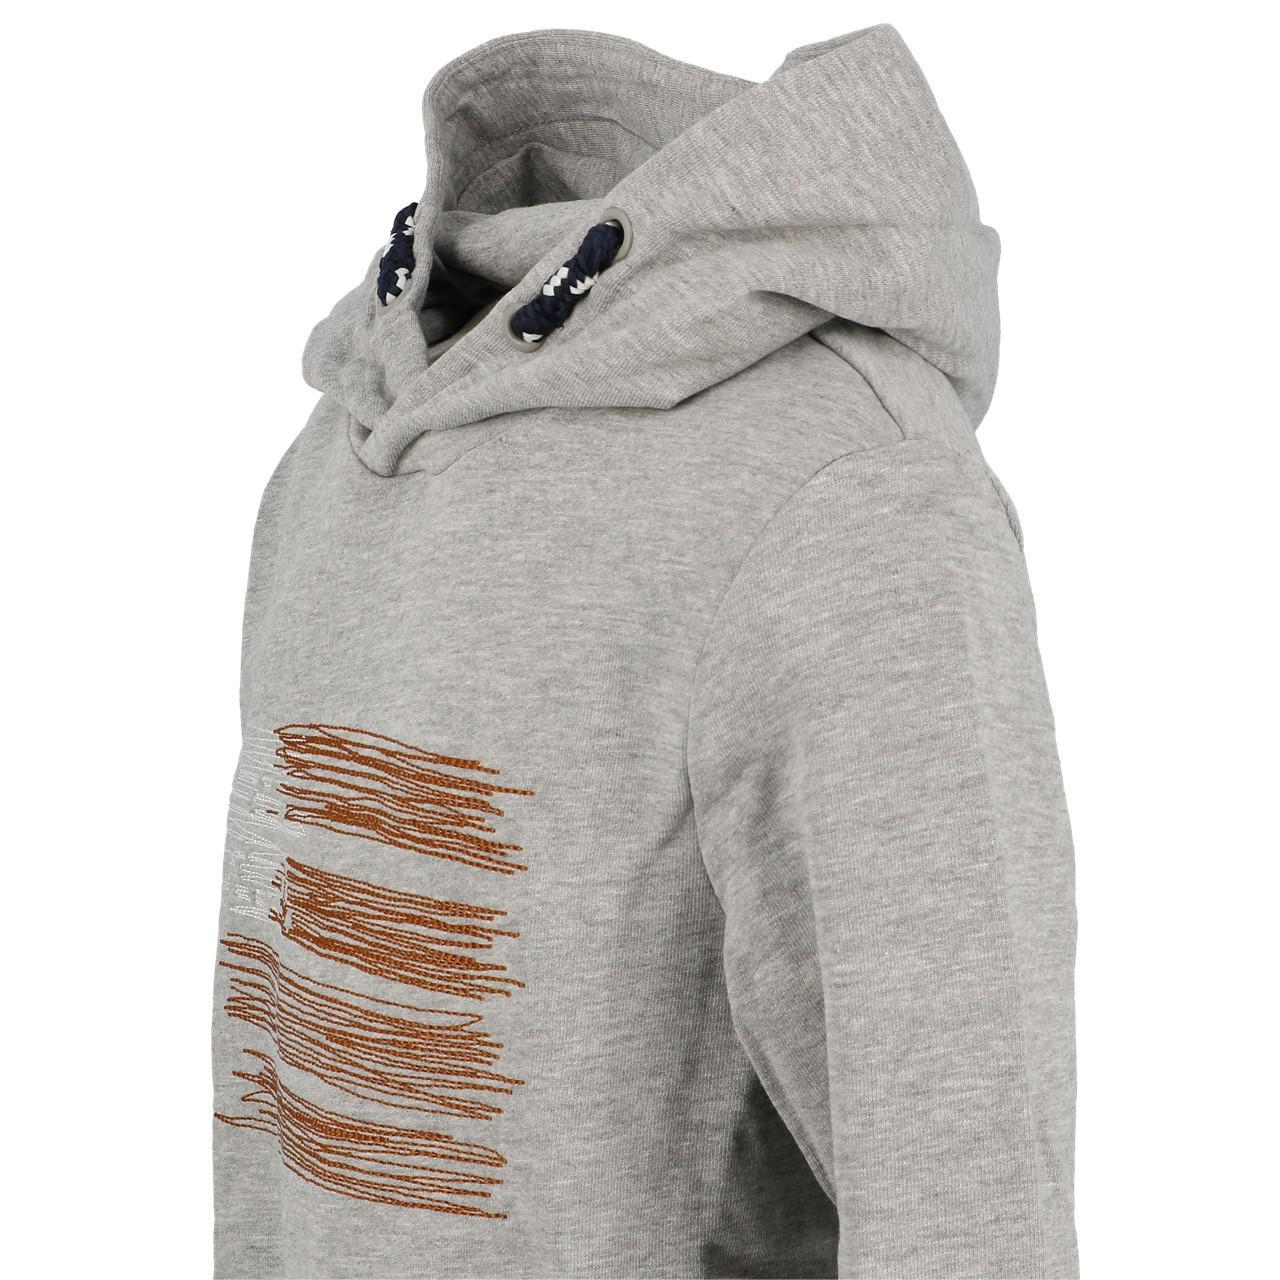 Sweatshirt-Kapuze-Kapuzenpulli-Name-It-Opilo-Grau-Mel-Sw-Jr-Grau-25908-Neu Indexbild 2